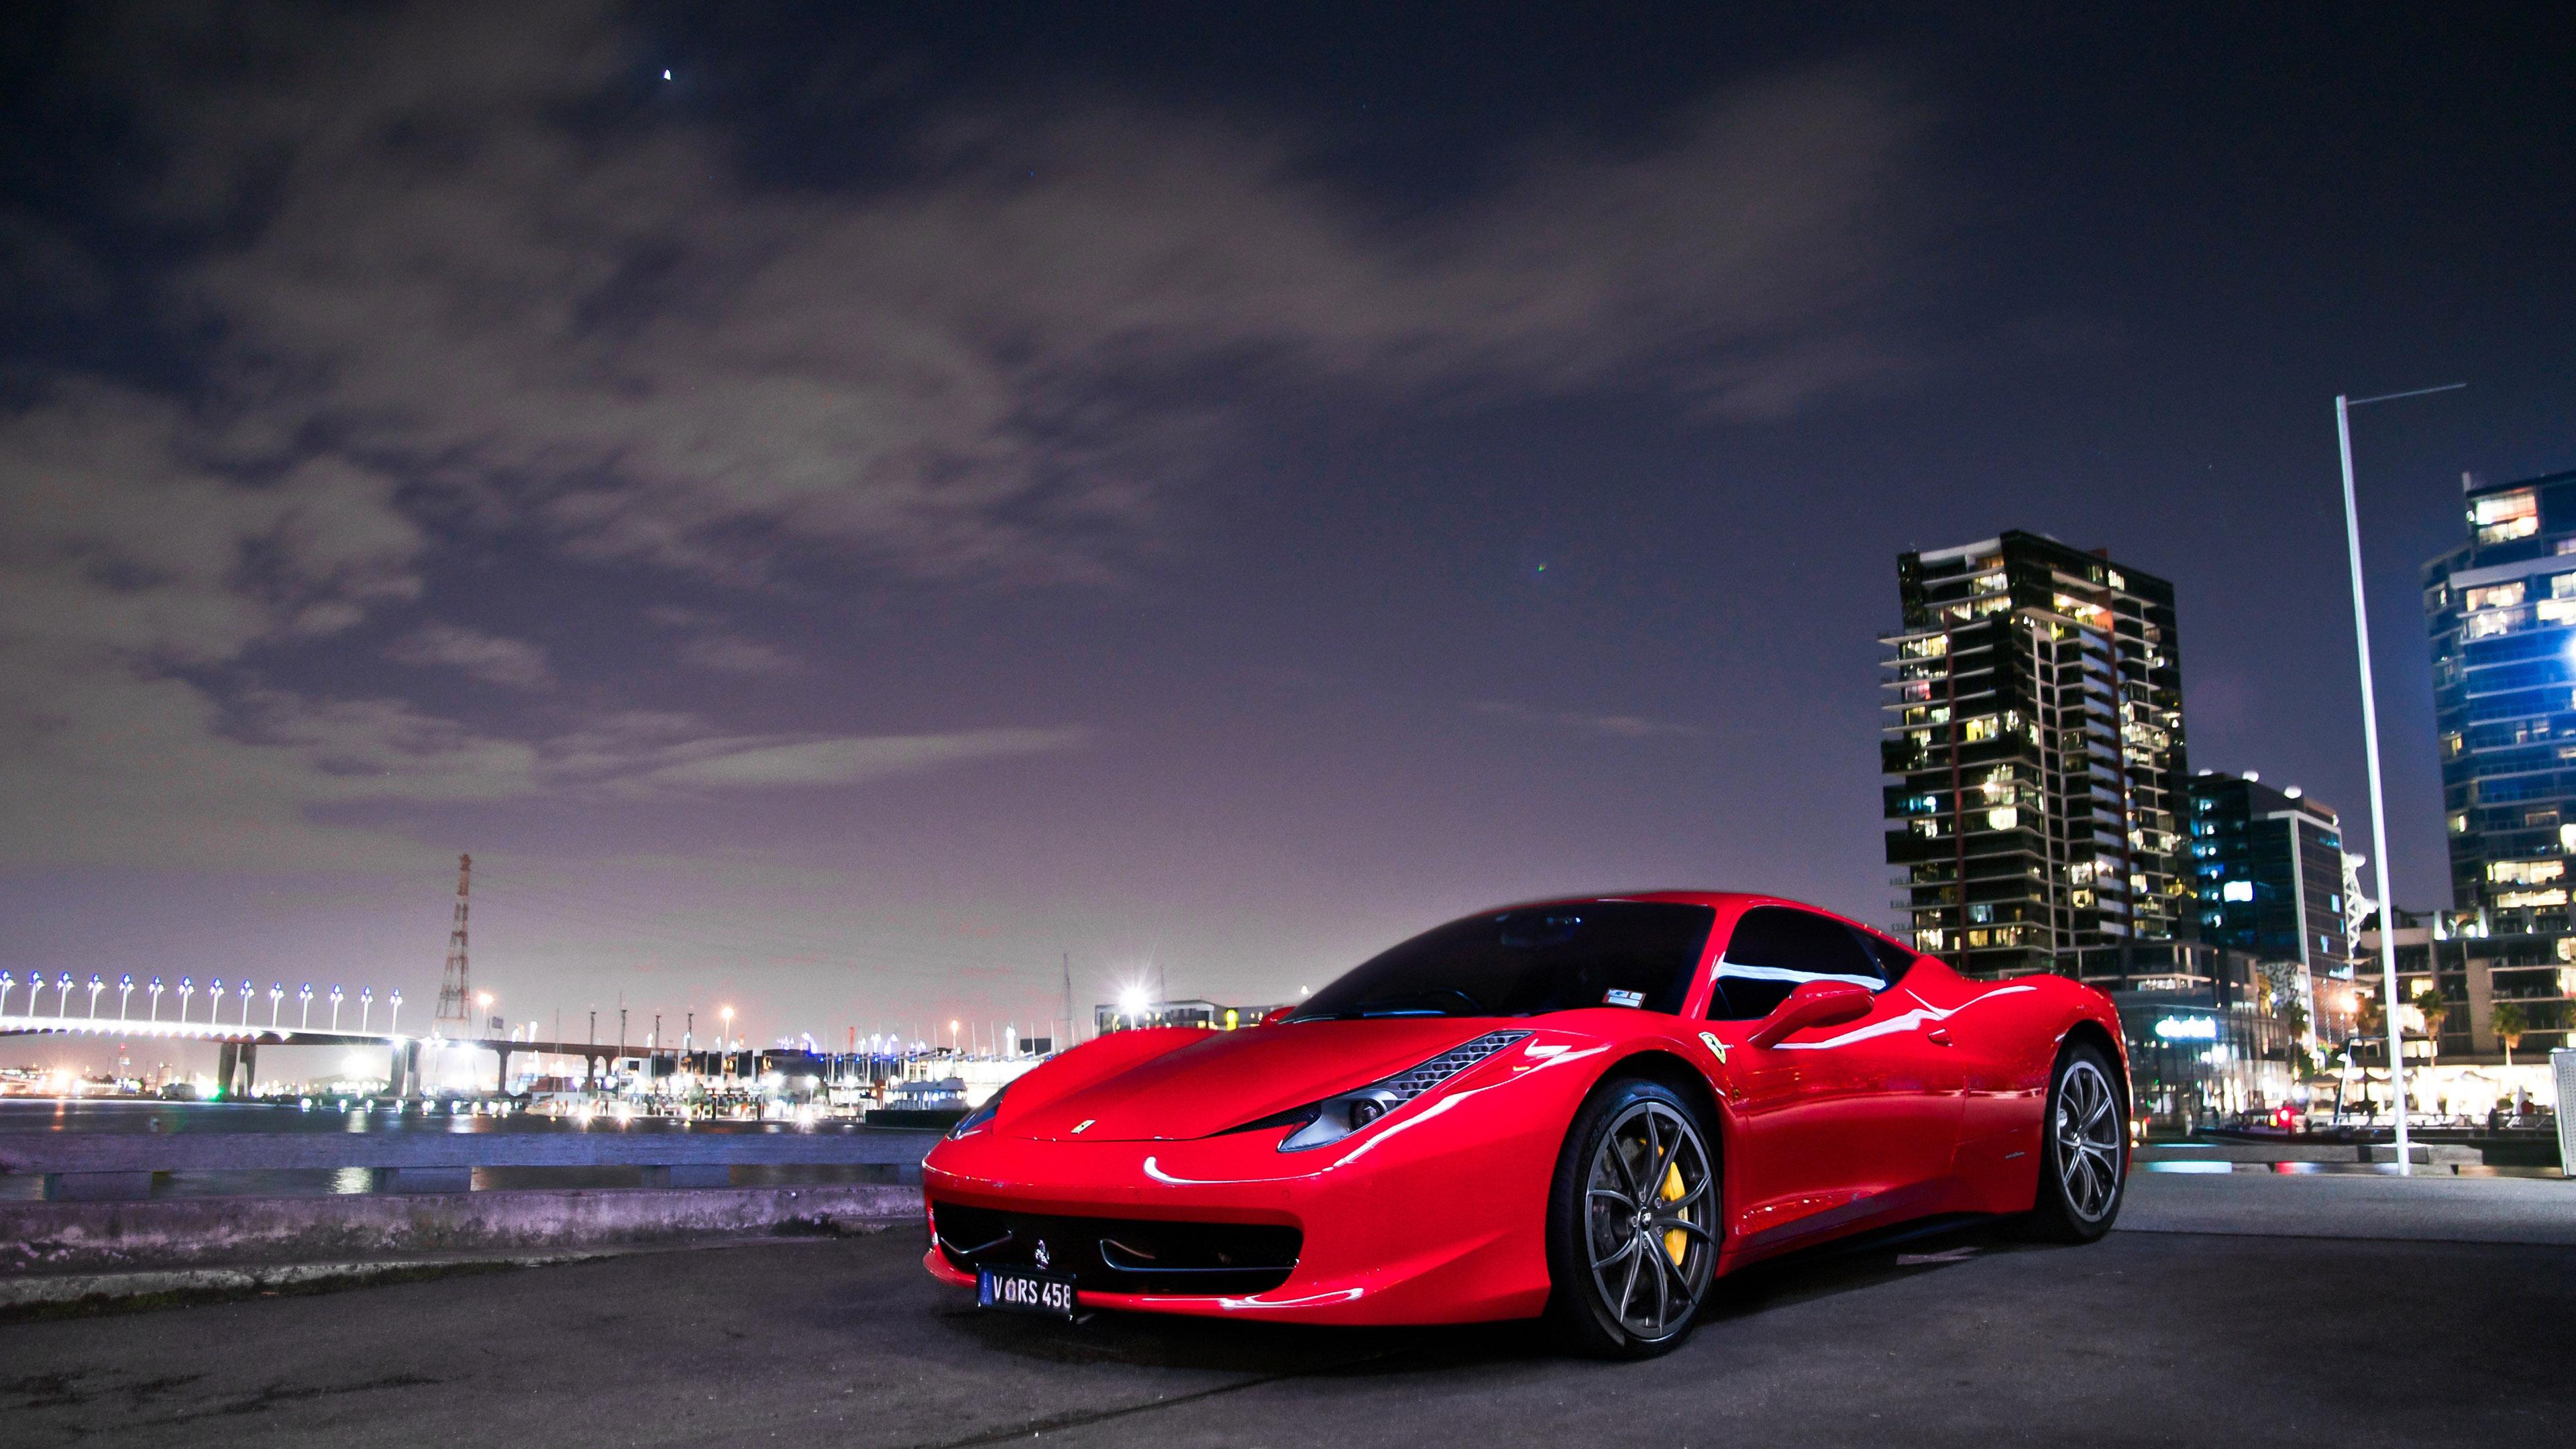 Ferrari 458 Italia wallpaper 33423 3840x2160